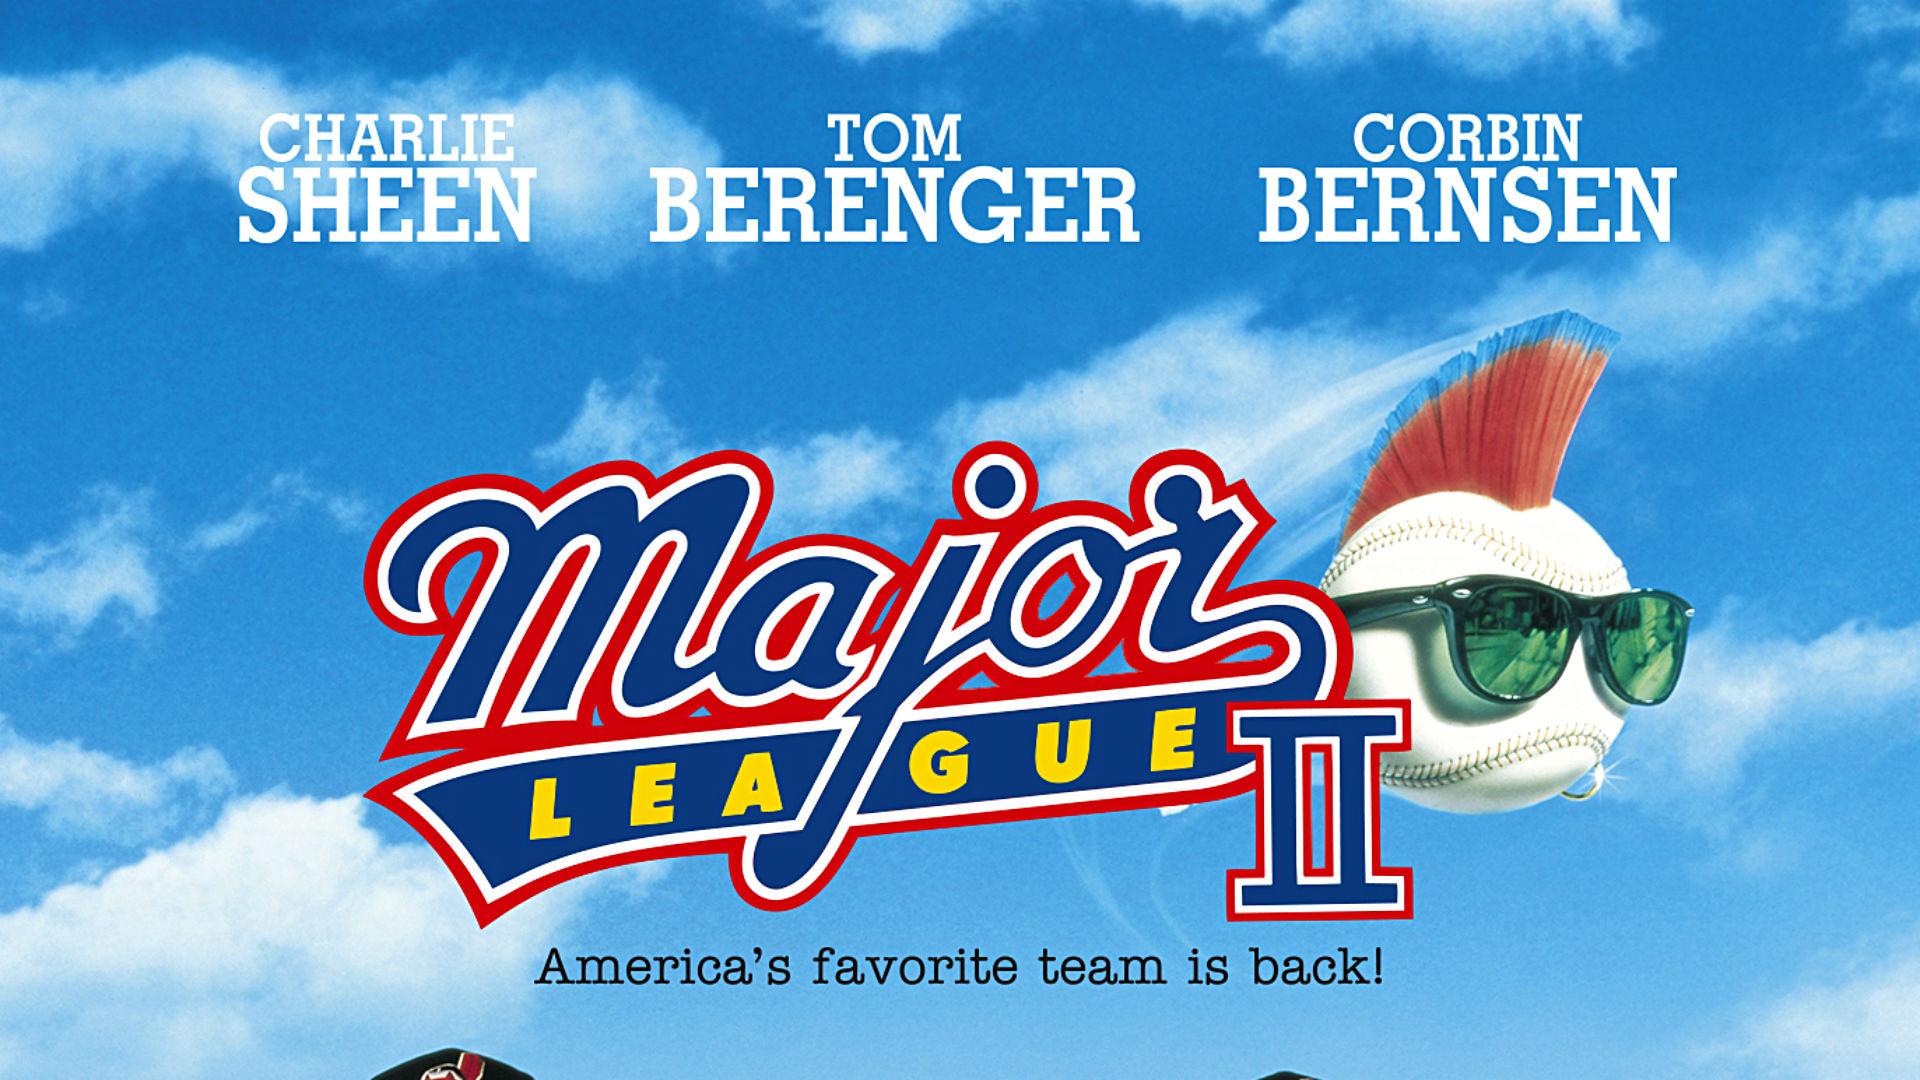 Major league movie poster with autographs